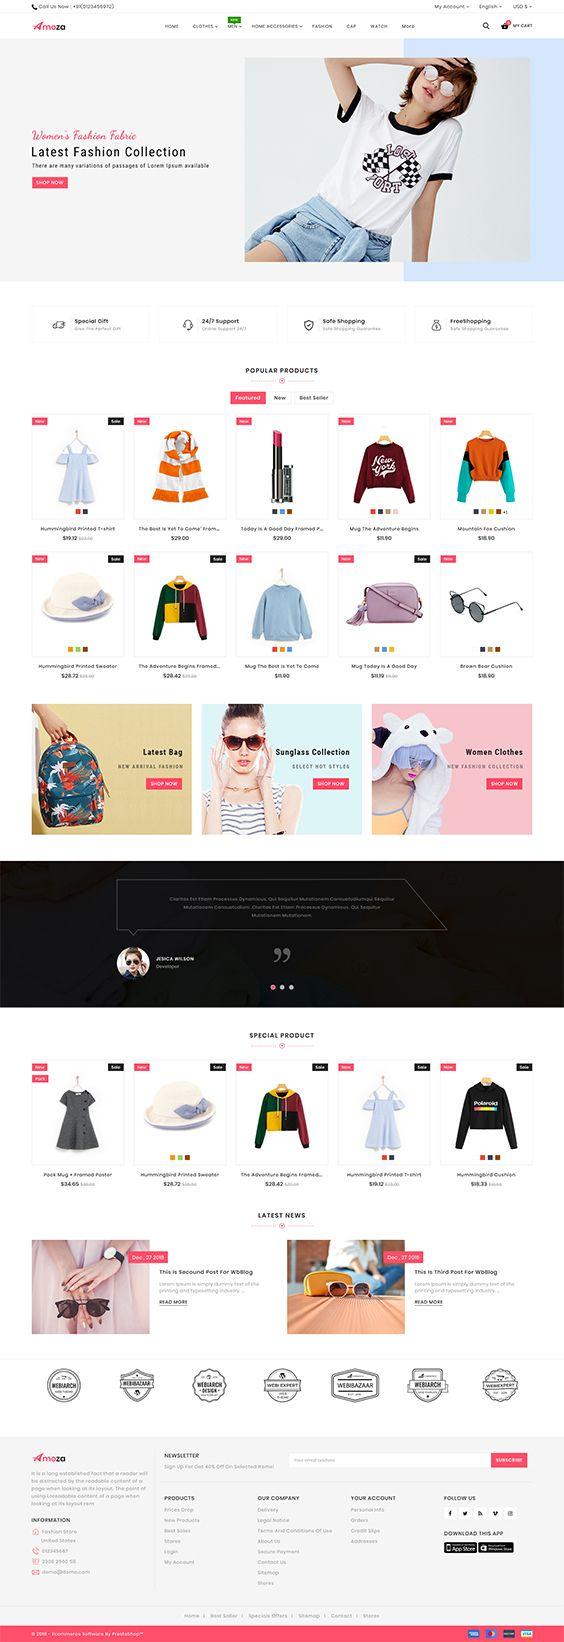 Amoza amoza - the fashion store template | e-commer website | shoe